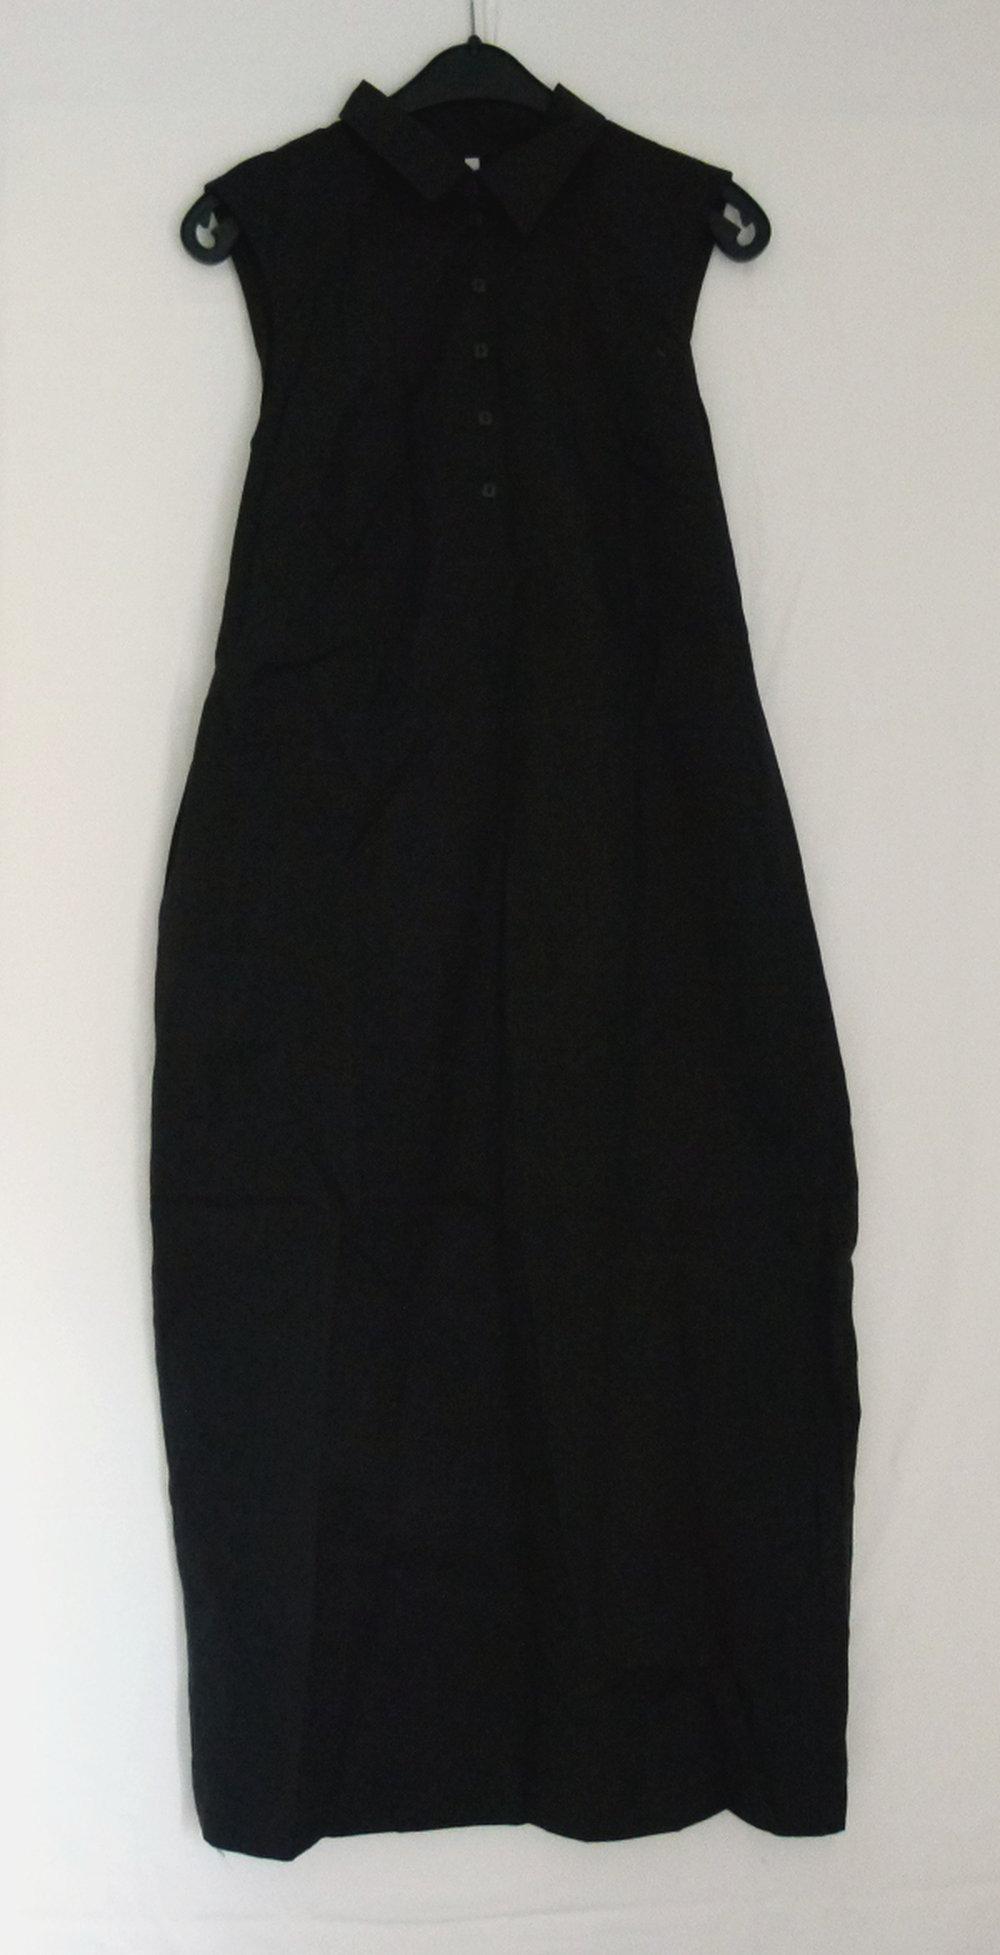 sportliches blusenkleid maxi kleid, schwarz, lang, sommer gothic boho mori  alternative goa festival lagenlook